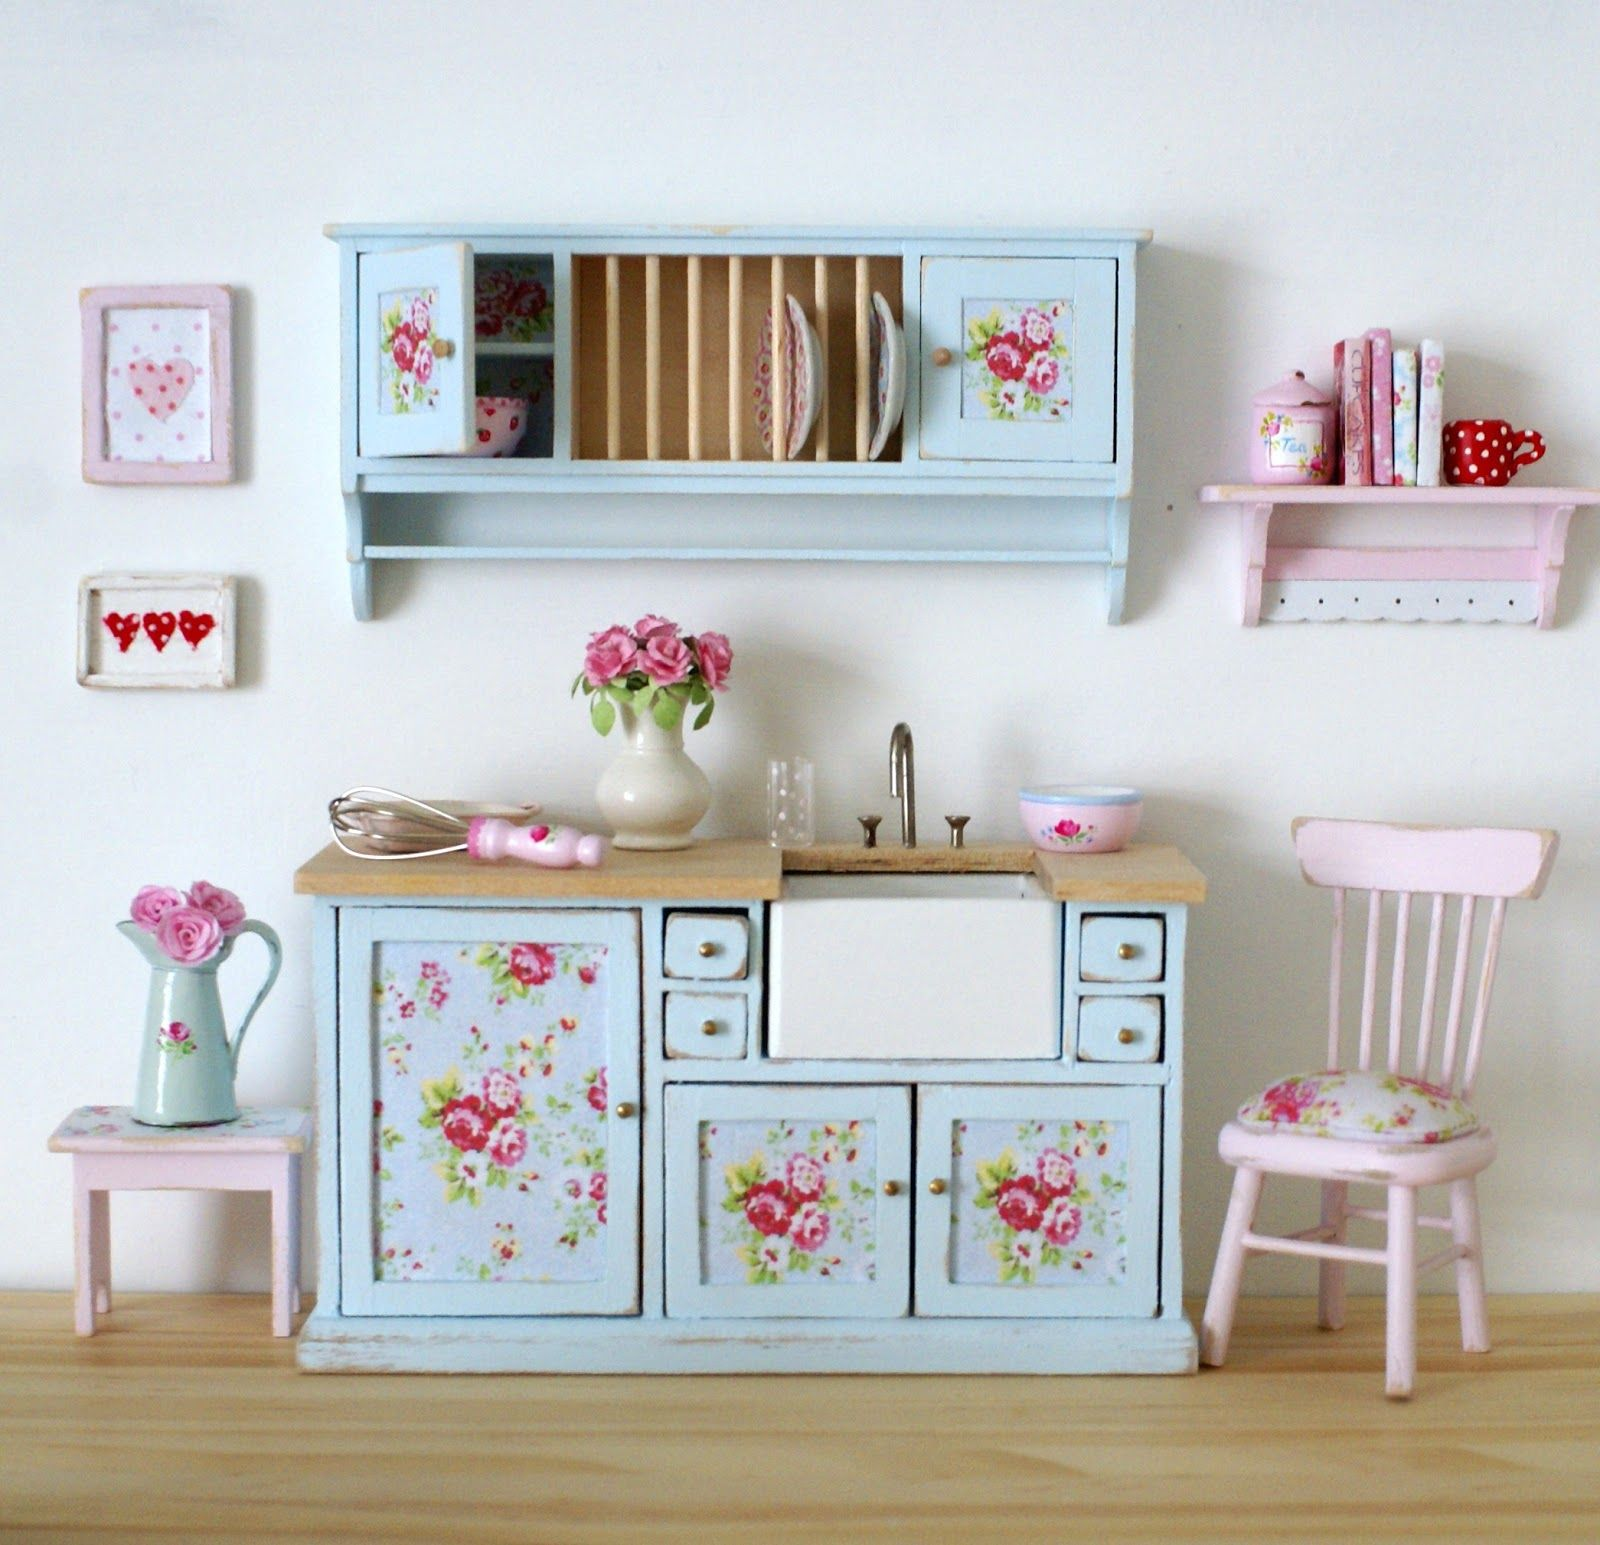 Lovejoy Bears Shabby kitchen  dollhouse  Pinterest  미니어처